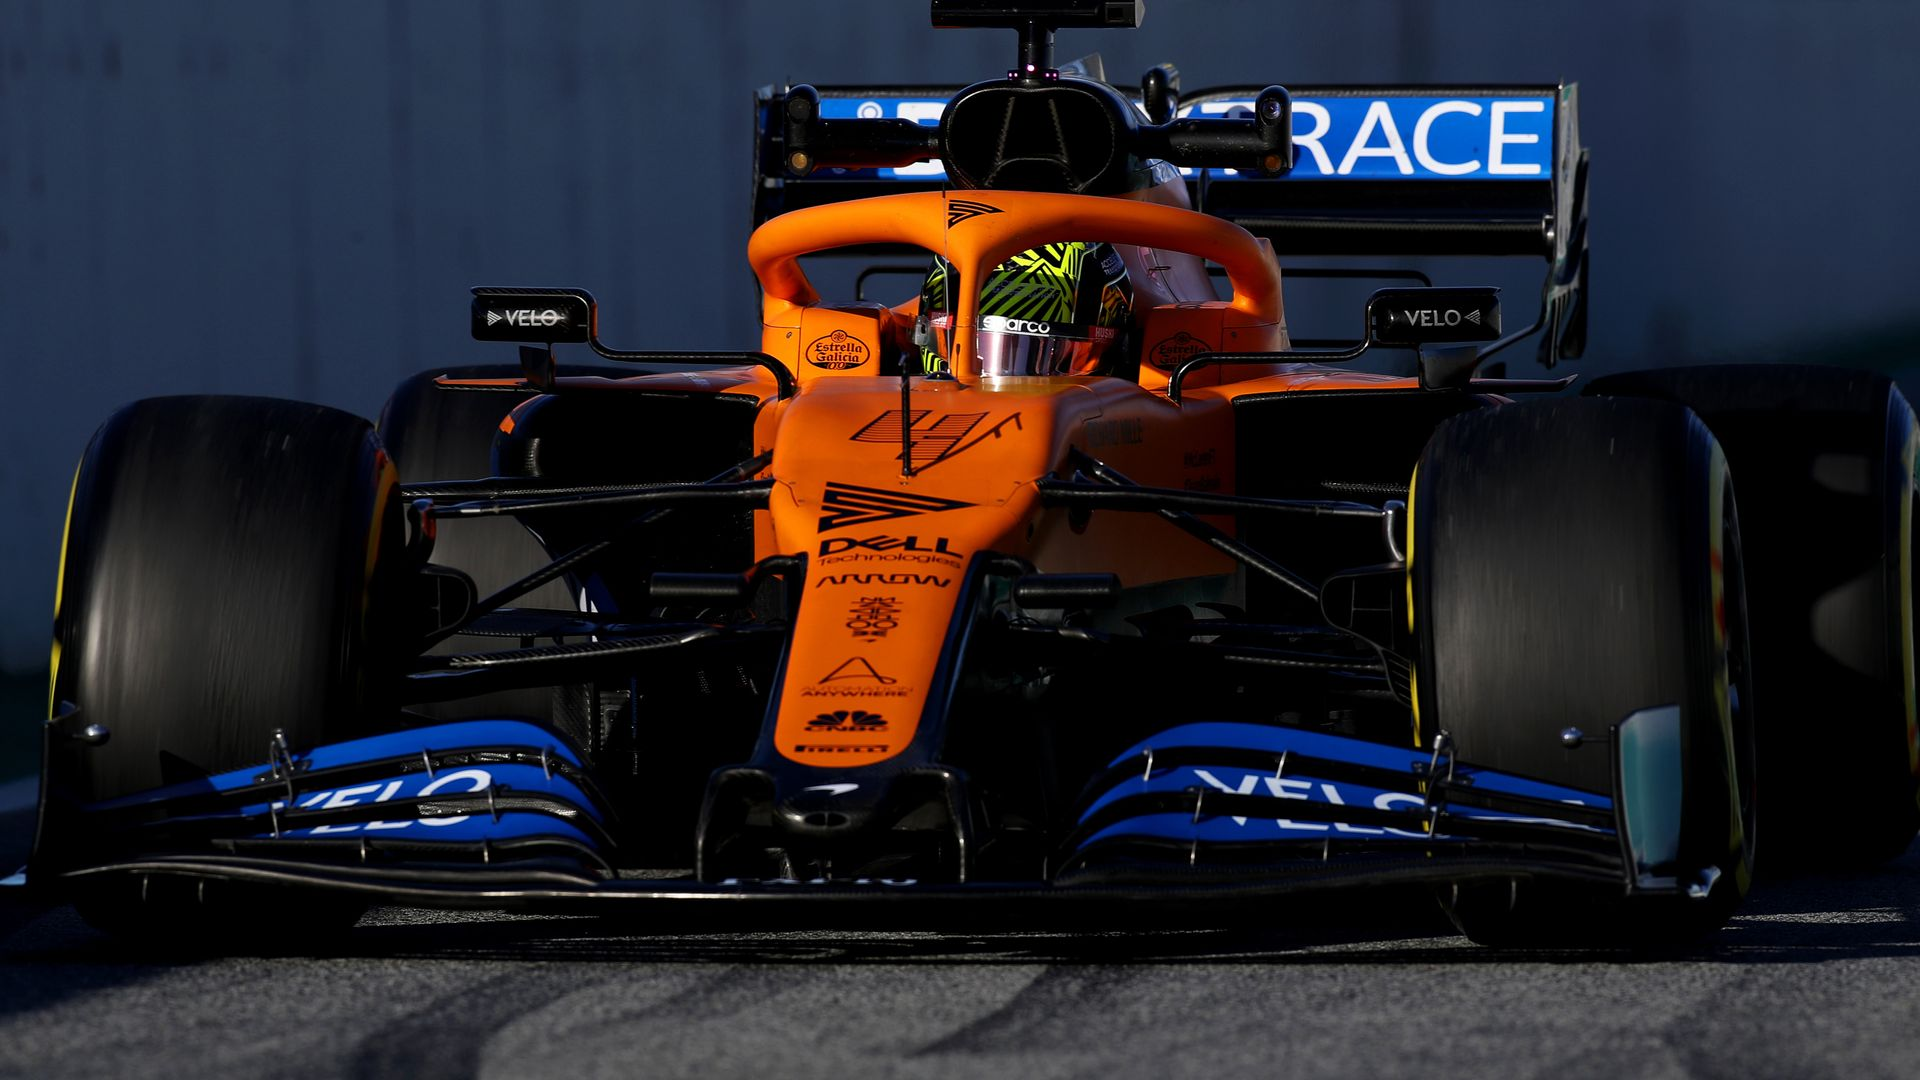 McLaren to cut 1,200 jobs across business